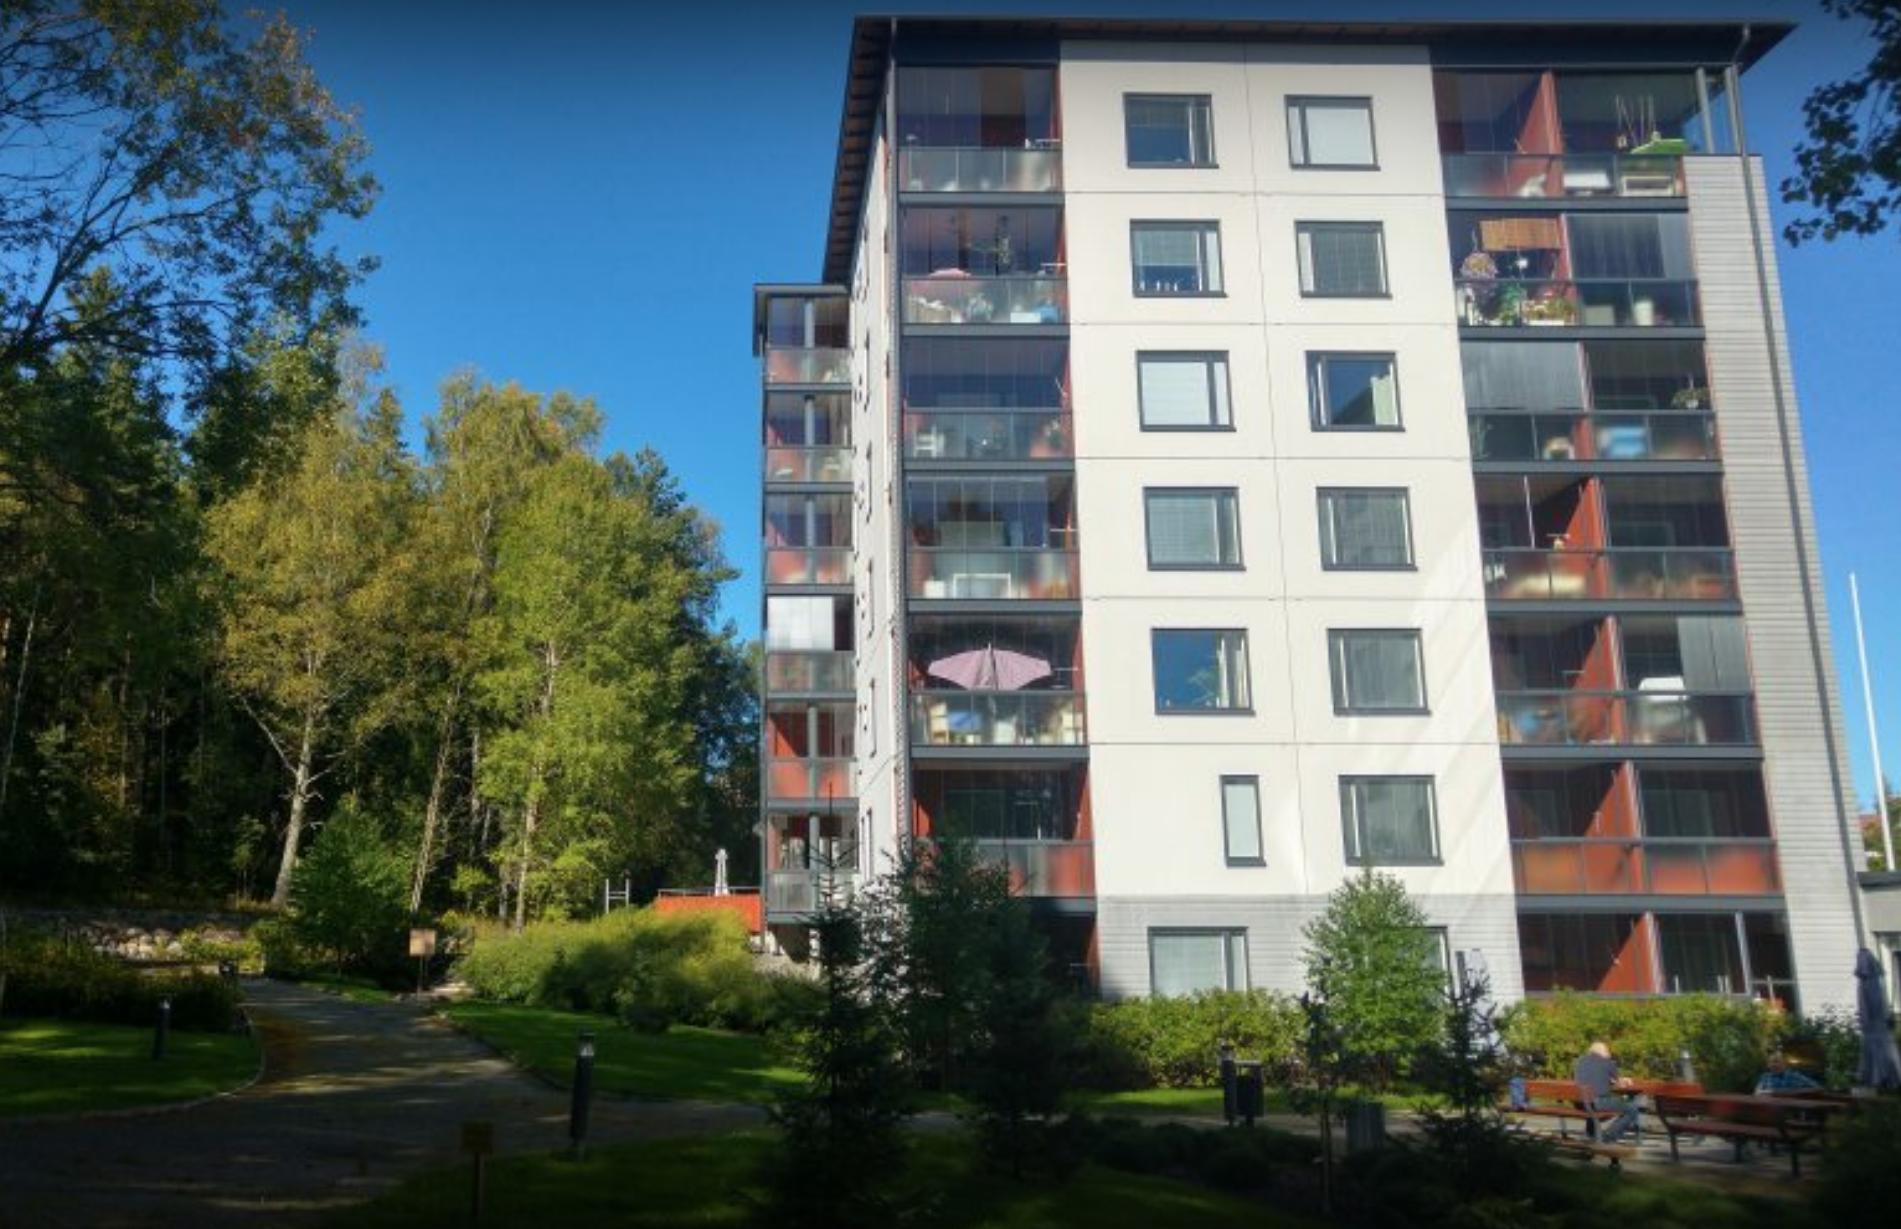 Vuokra-asunnot / senioriasunnot Kaarina